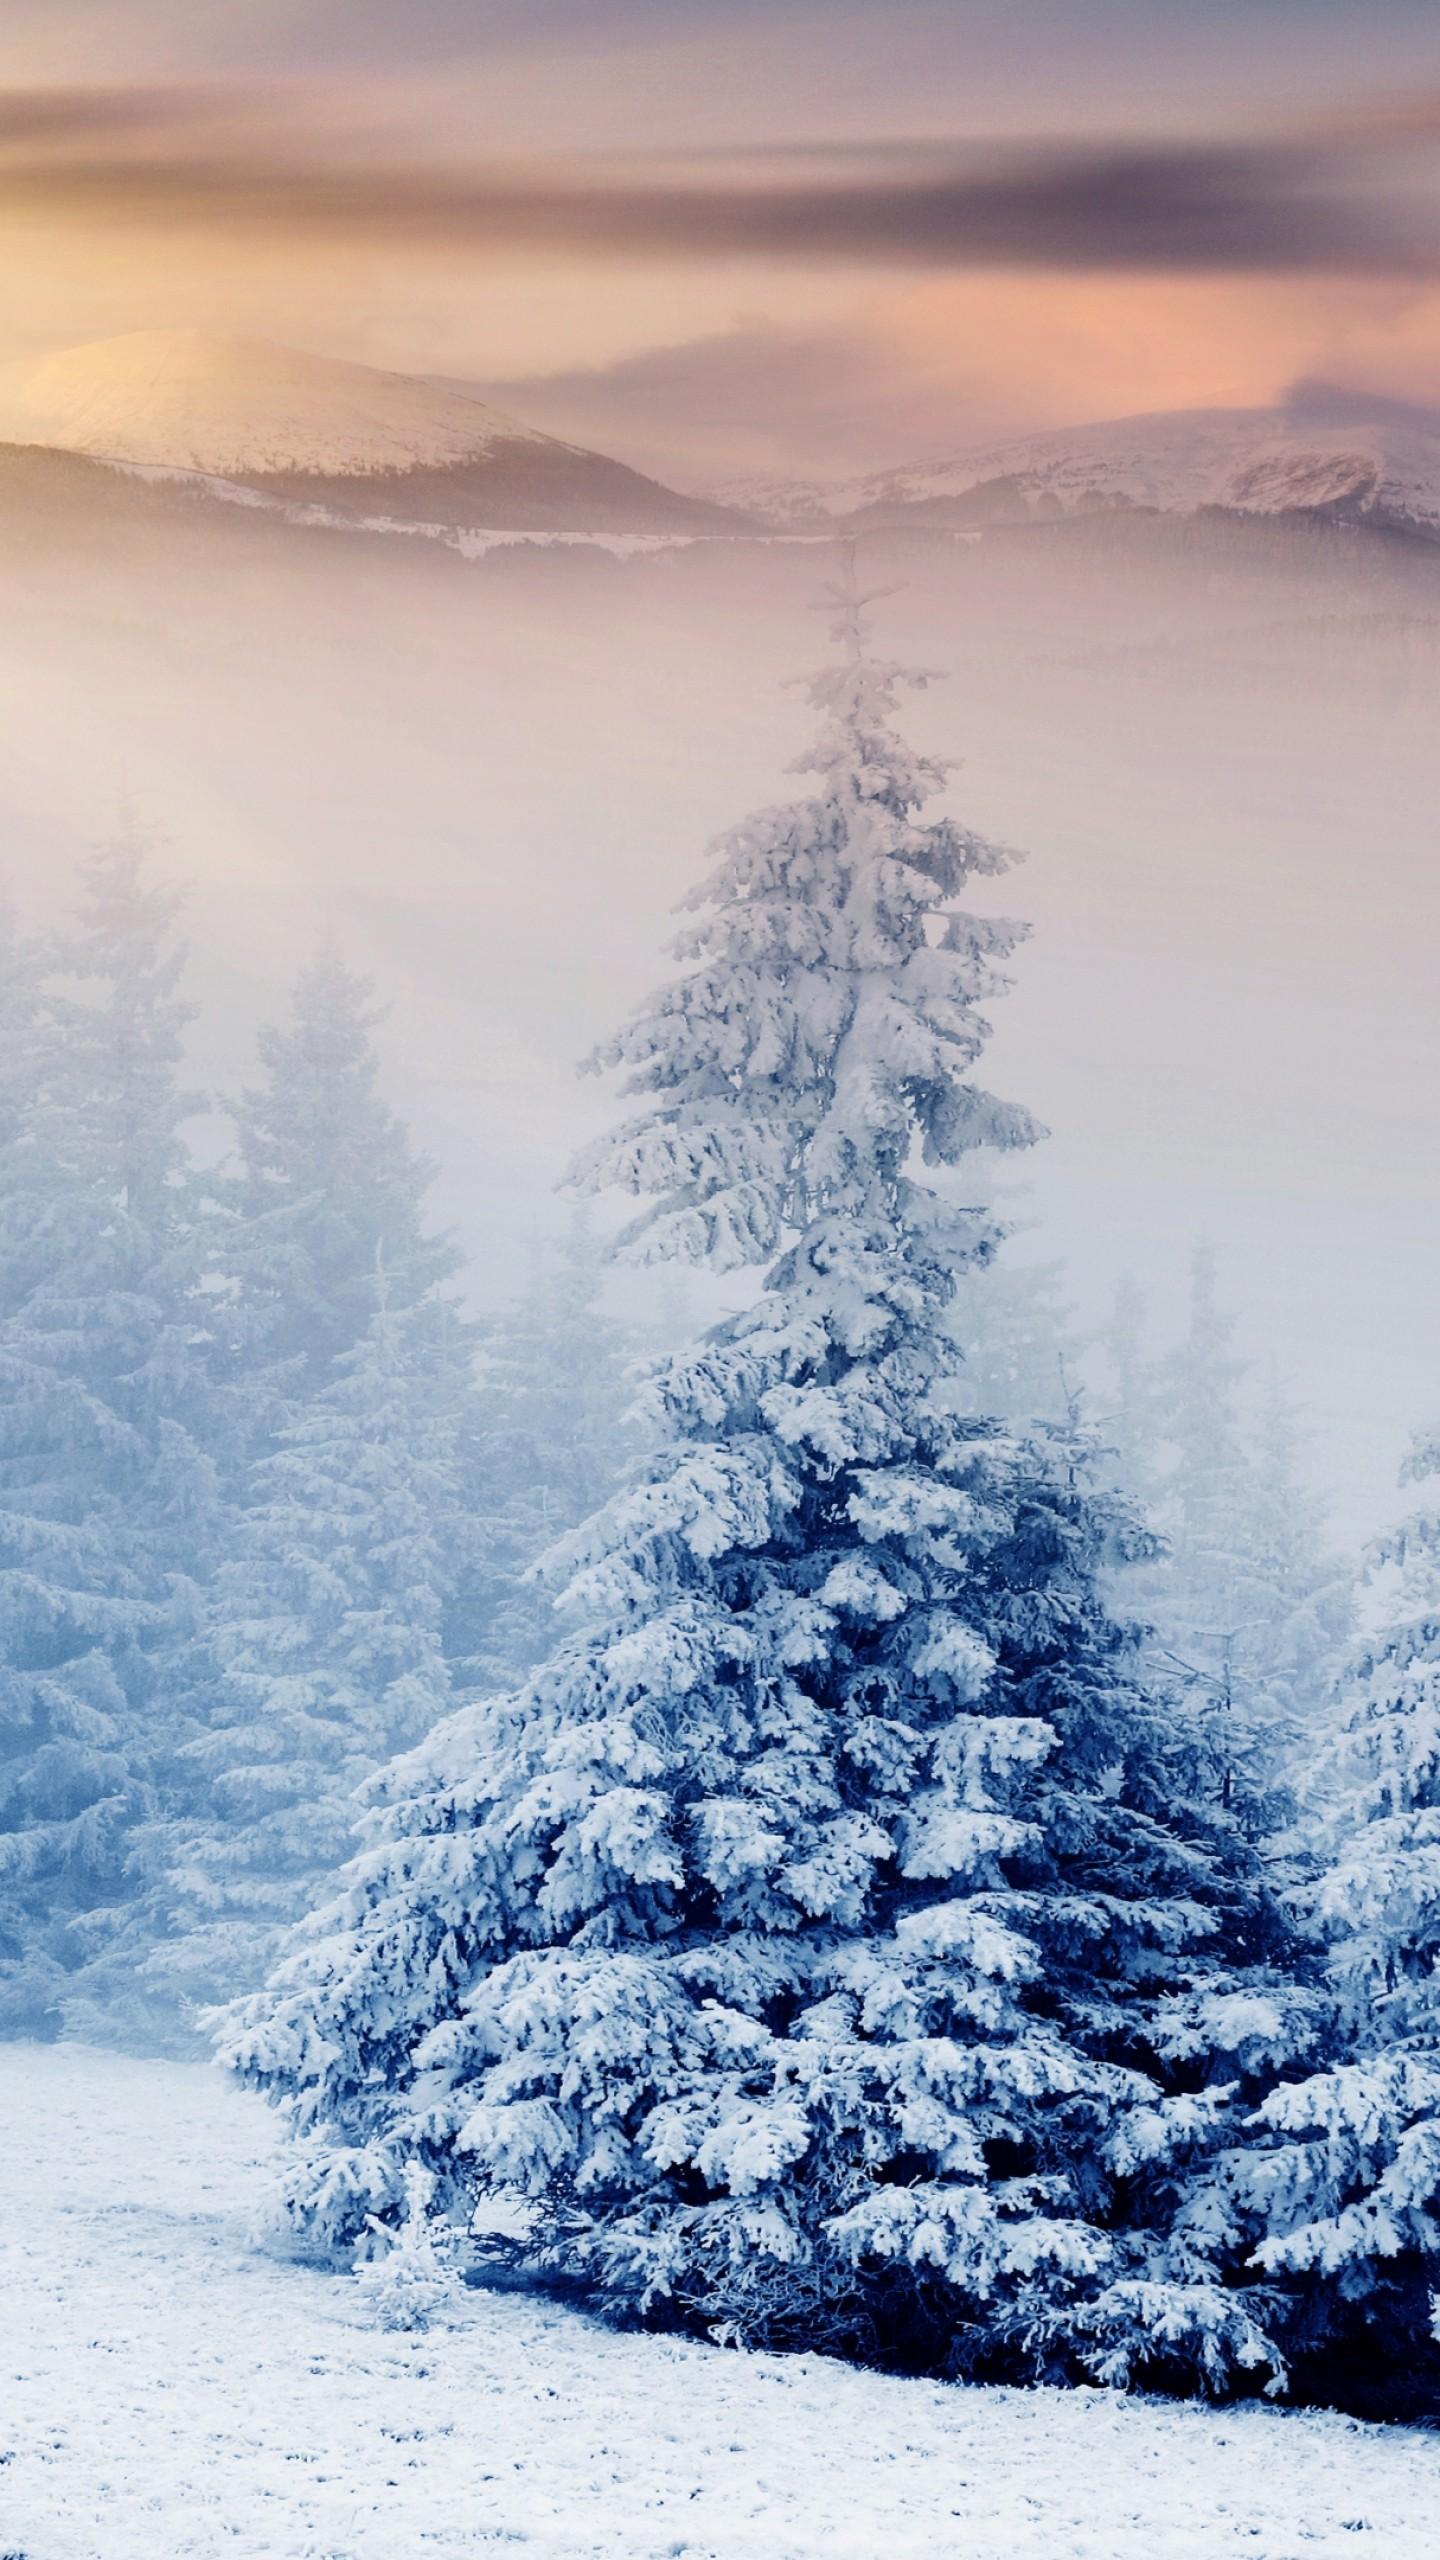 Wallpaper Trees 5k 4k Wallpaper Pines Mountains Snow